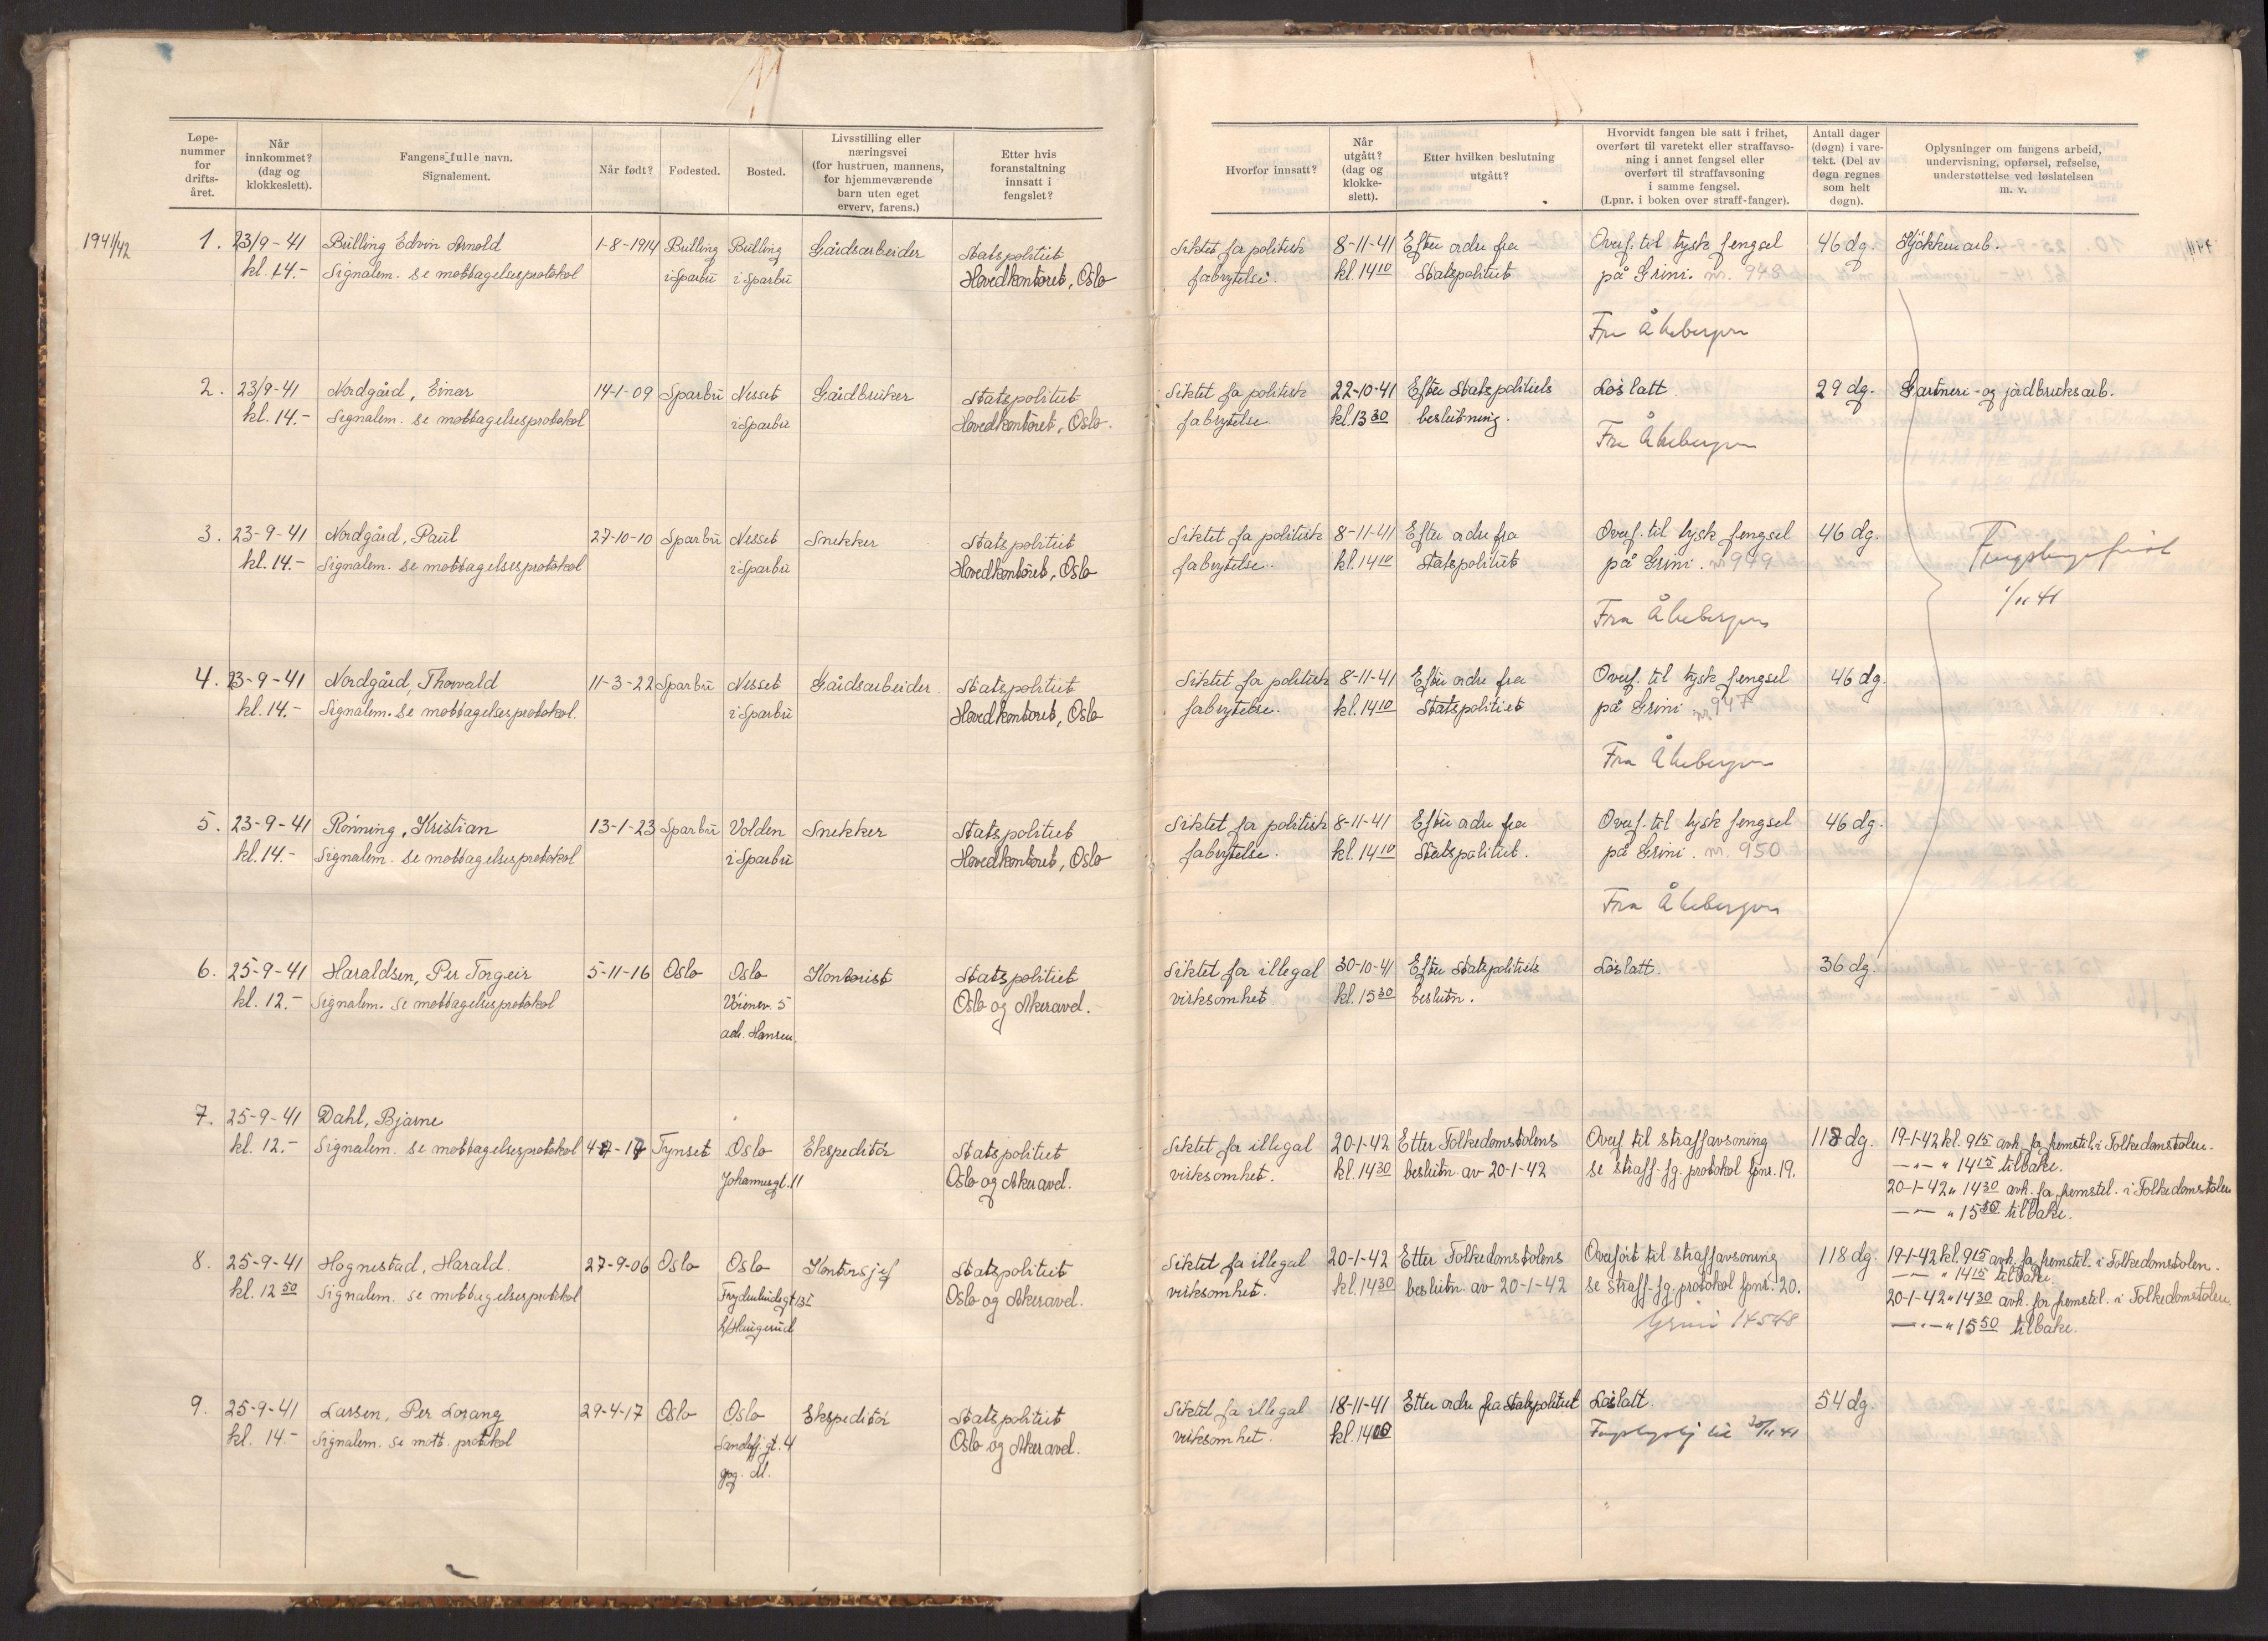 RA, Statspolitiet - Hovedkontoret / Osloavdelingen, C/Cl/L0001: Varetektsprotokoll, 1941-1943